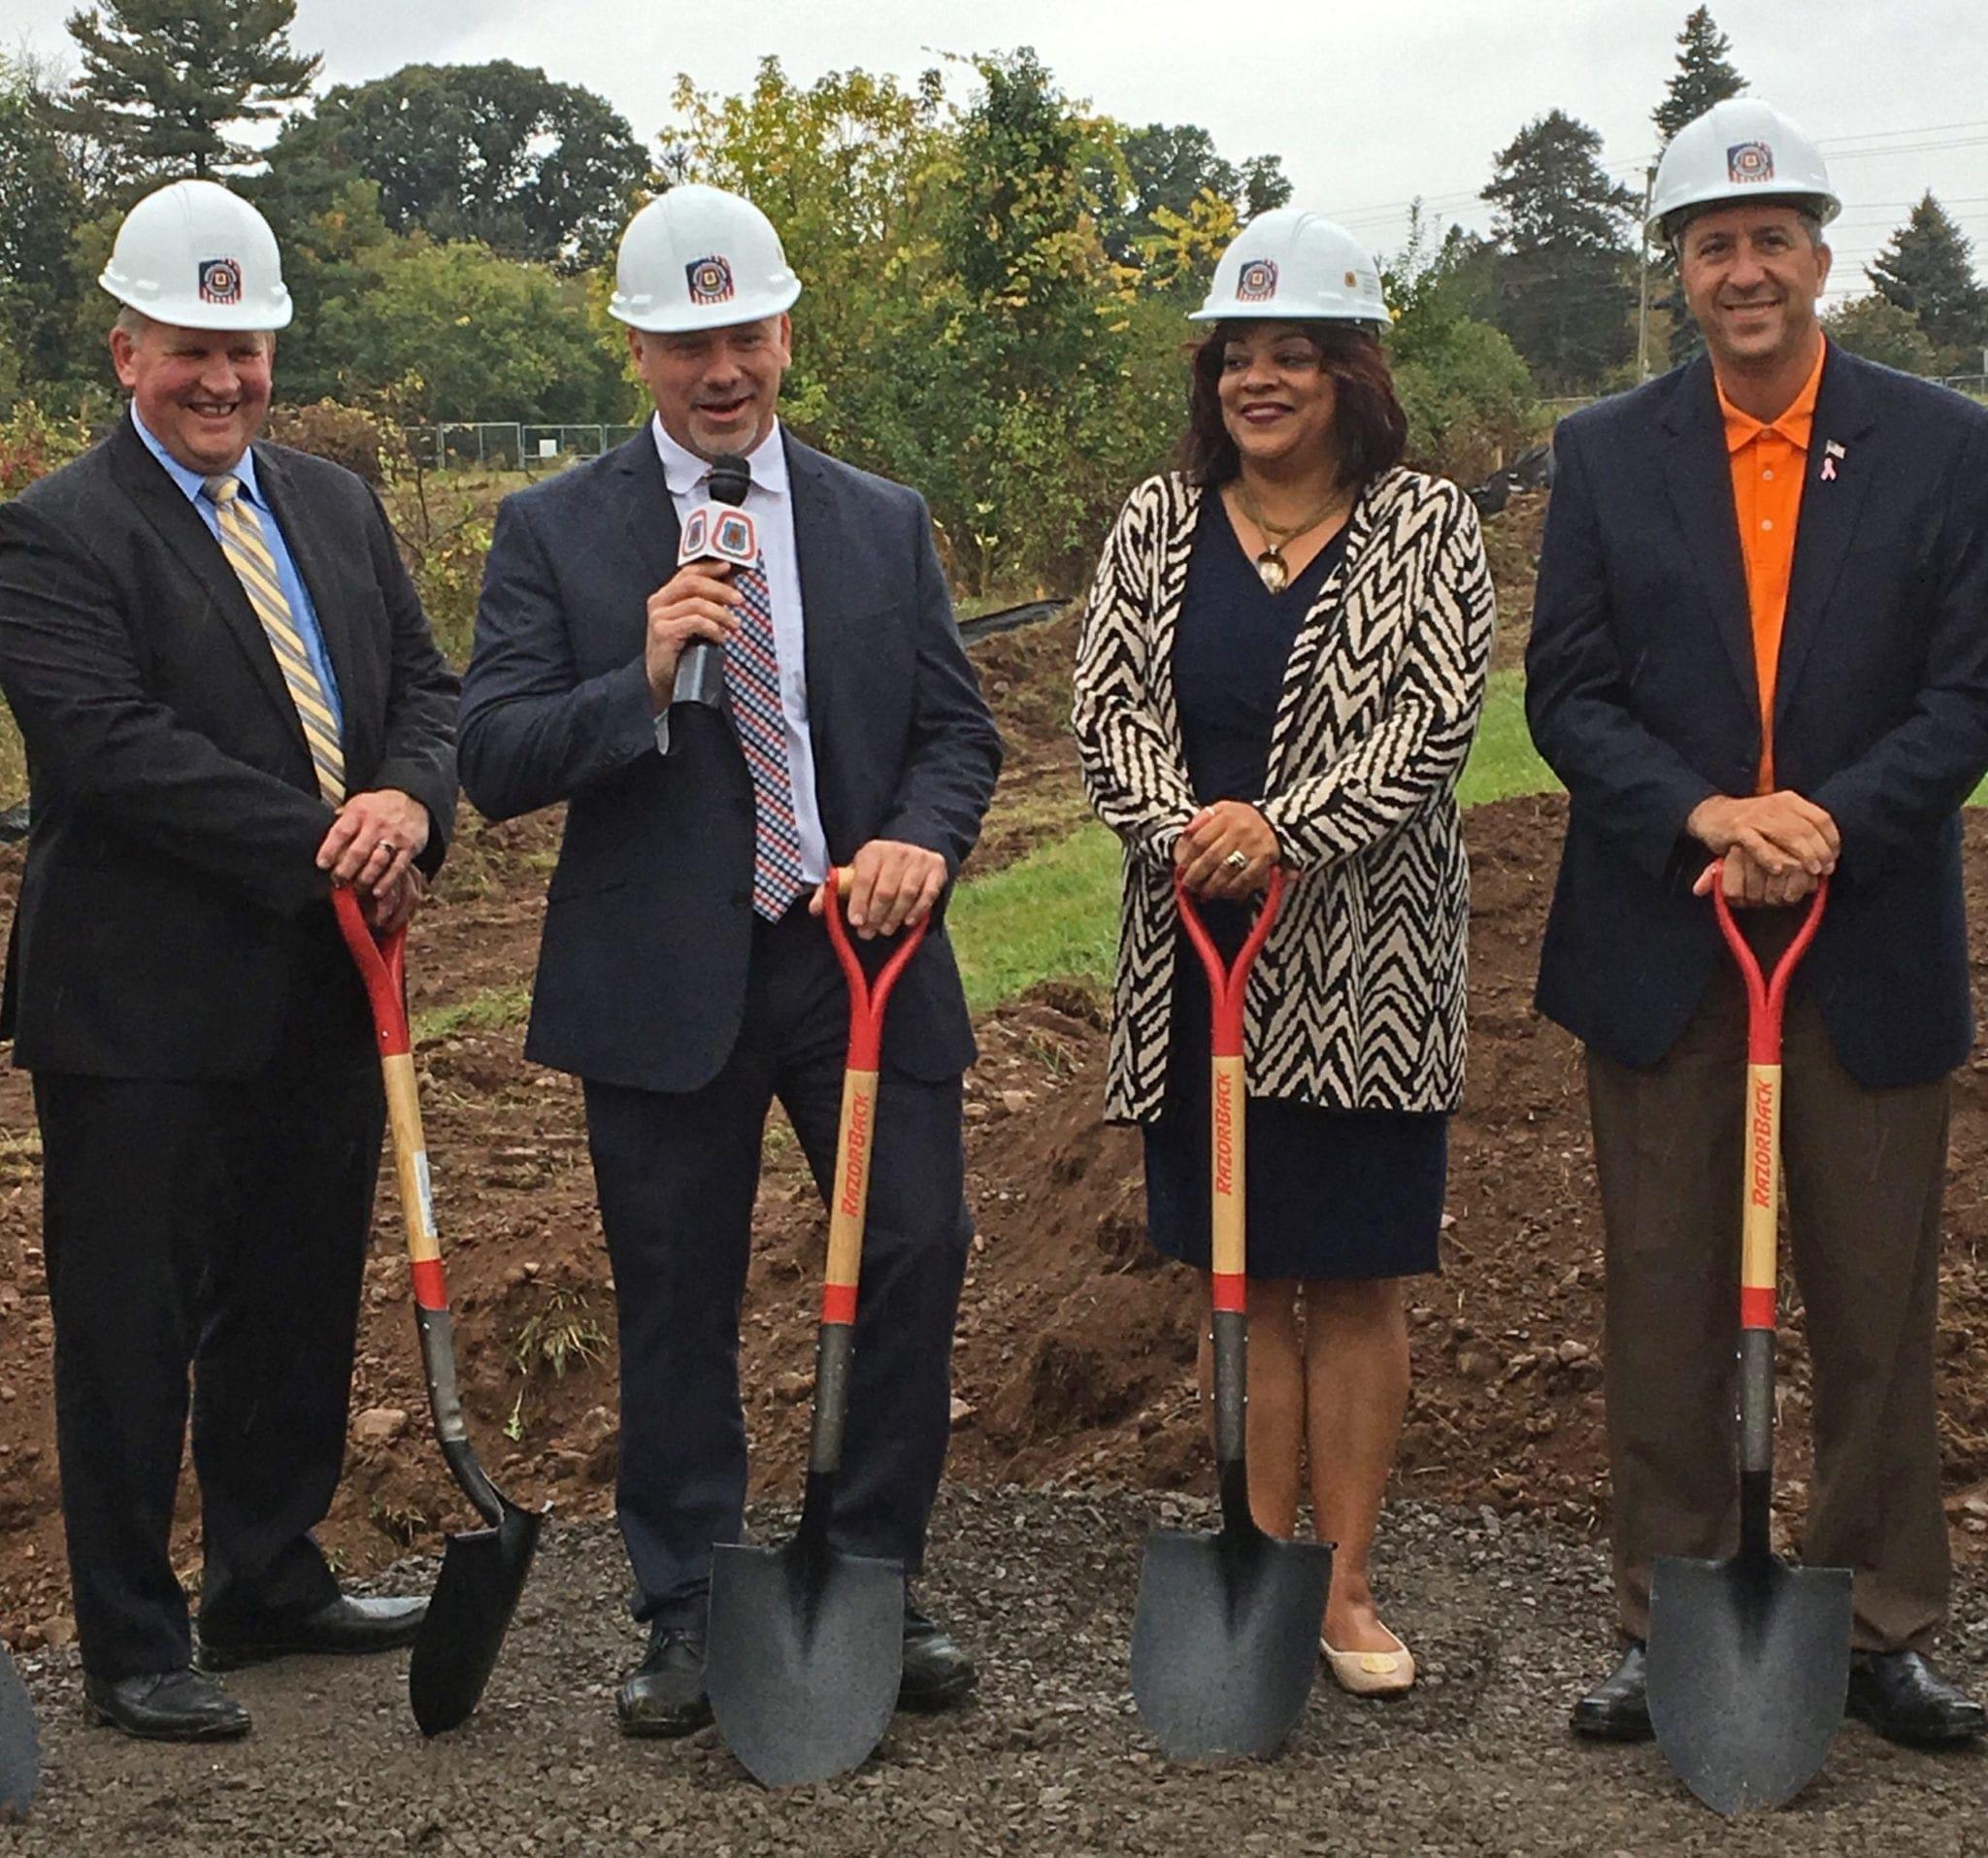 Salina: Carpenters union to build $5 million training center